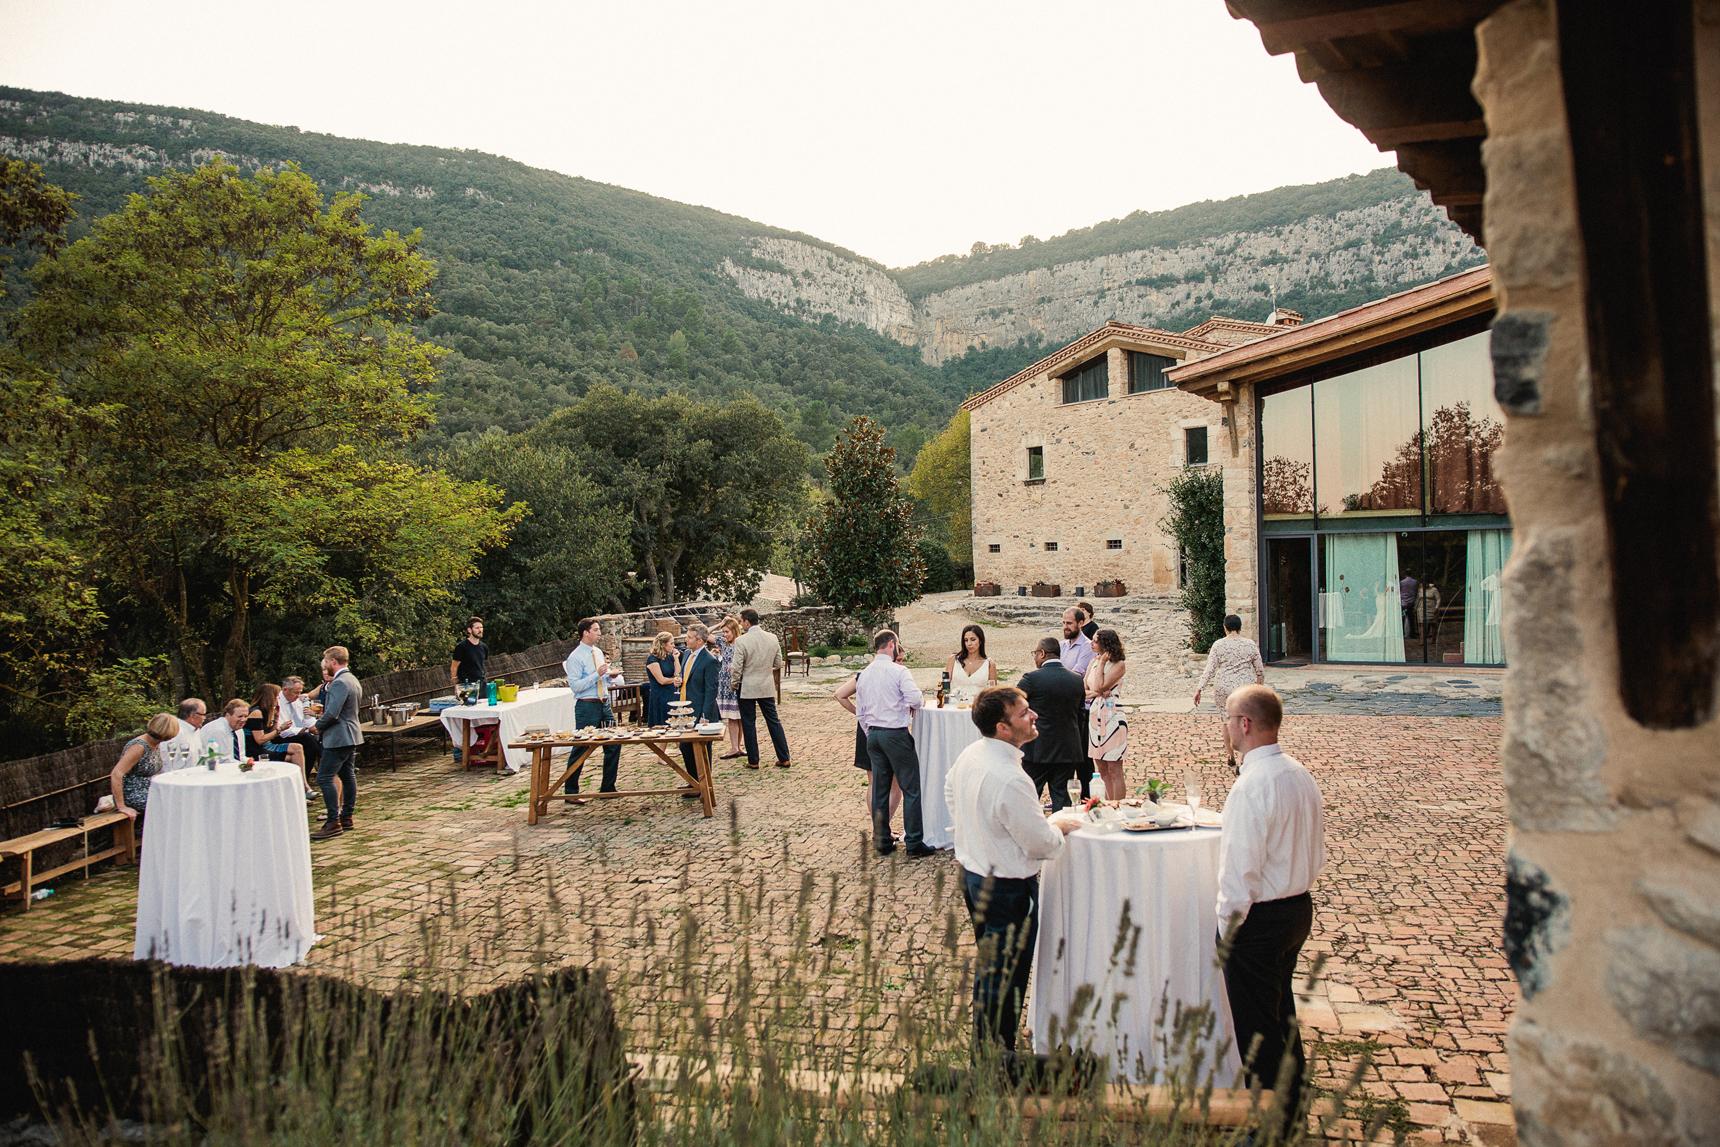 Short_Girona_Spain_WeddingPhotographer079.jpg